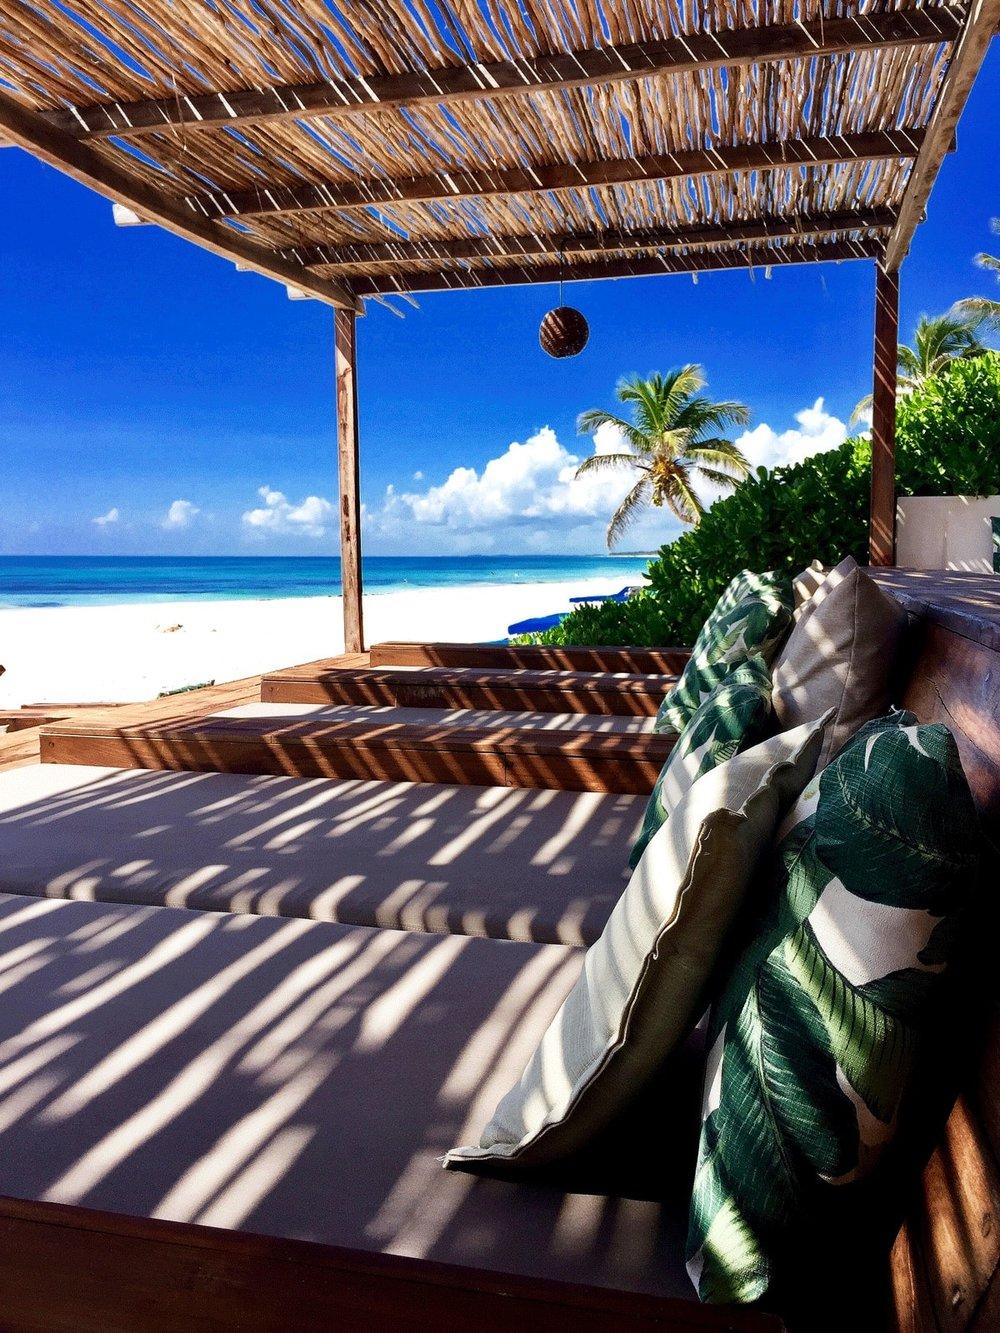 amansala-tulum-mexico-wellness-resort-27-min.jpg